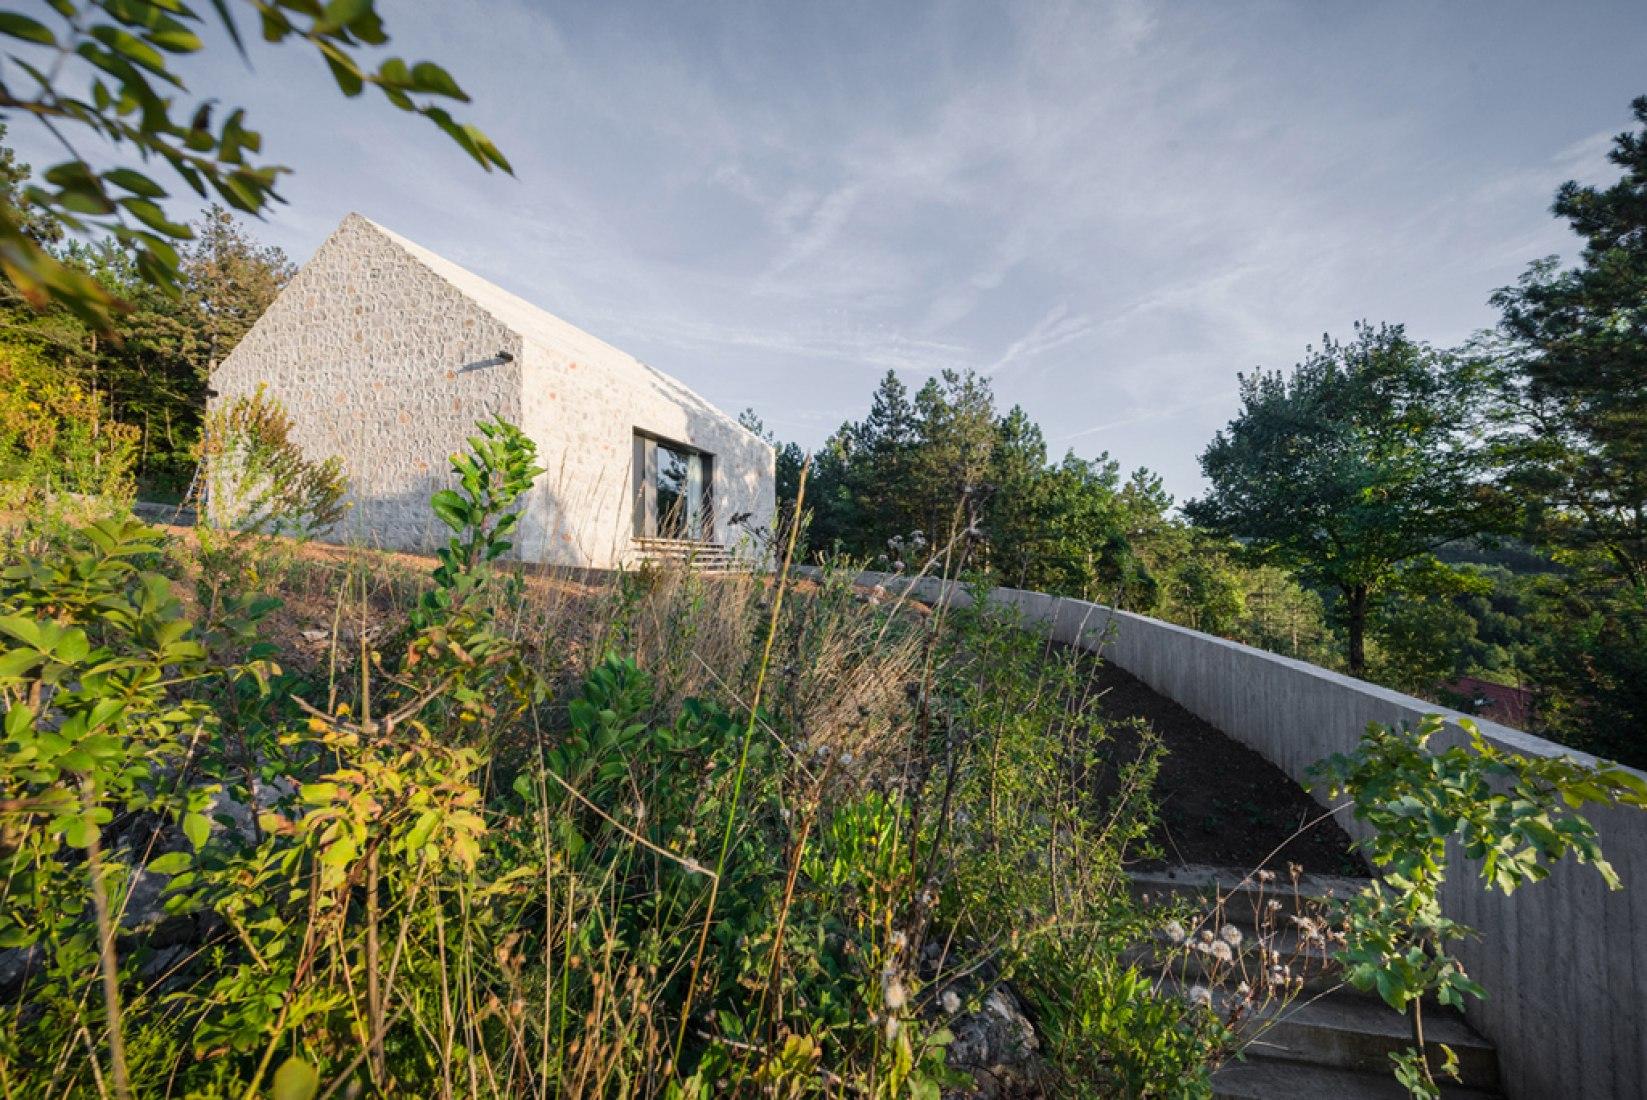 Compact Karst House by Dekleva Gregorič Arhitekti. Photograph © Janez Marolt.